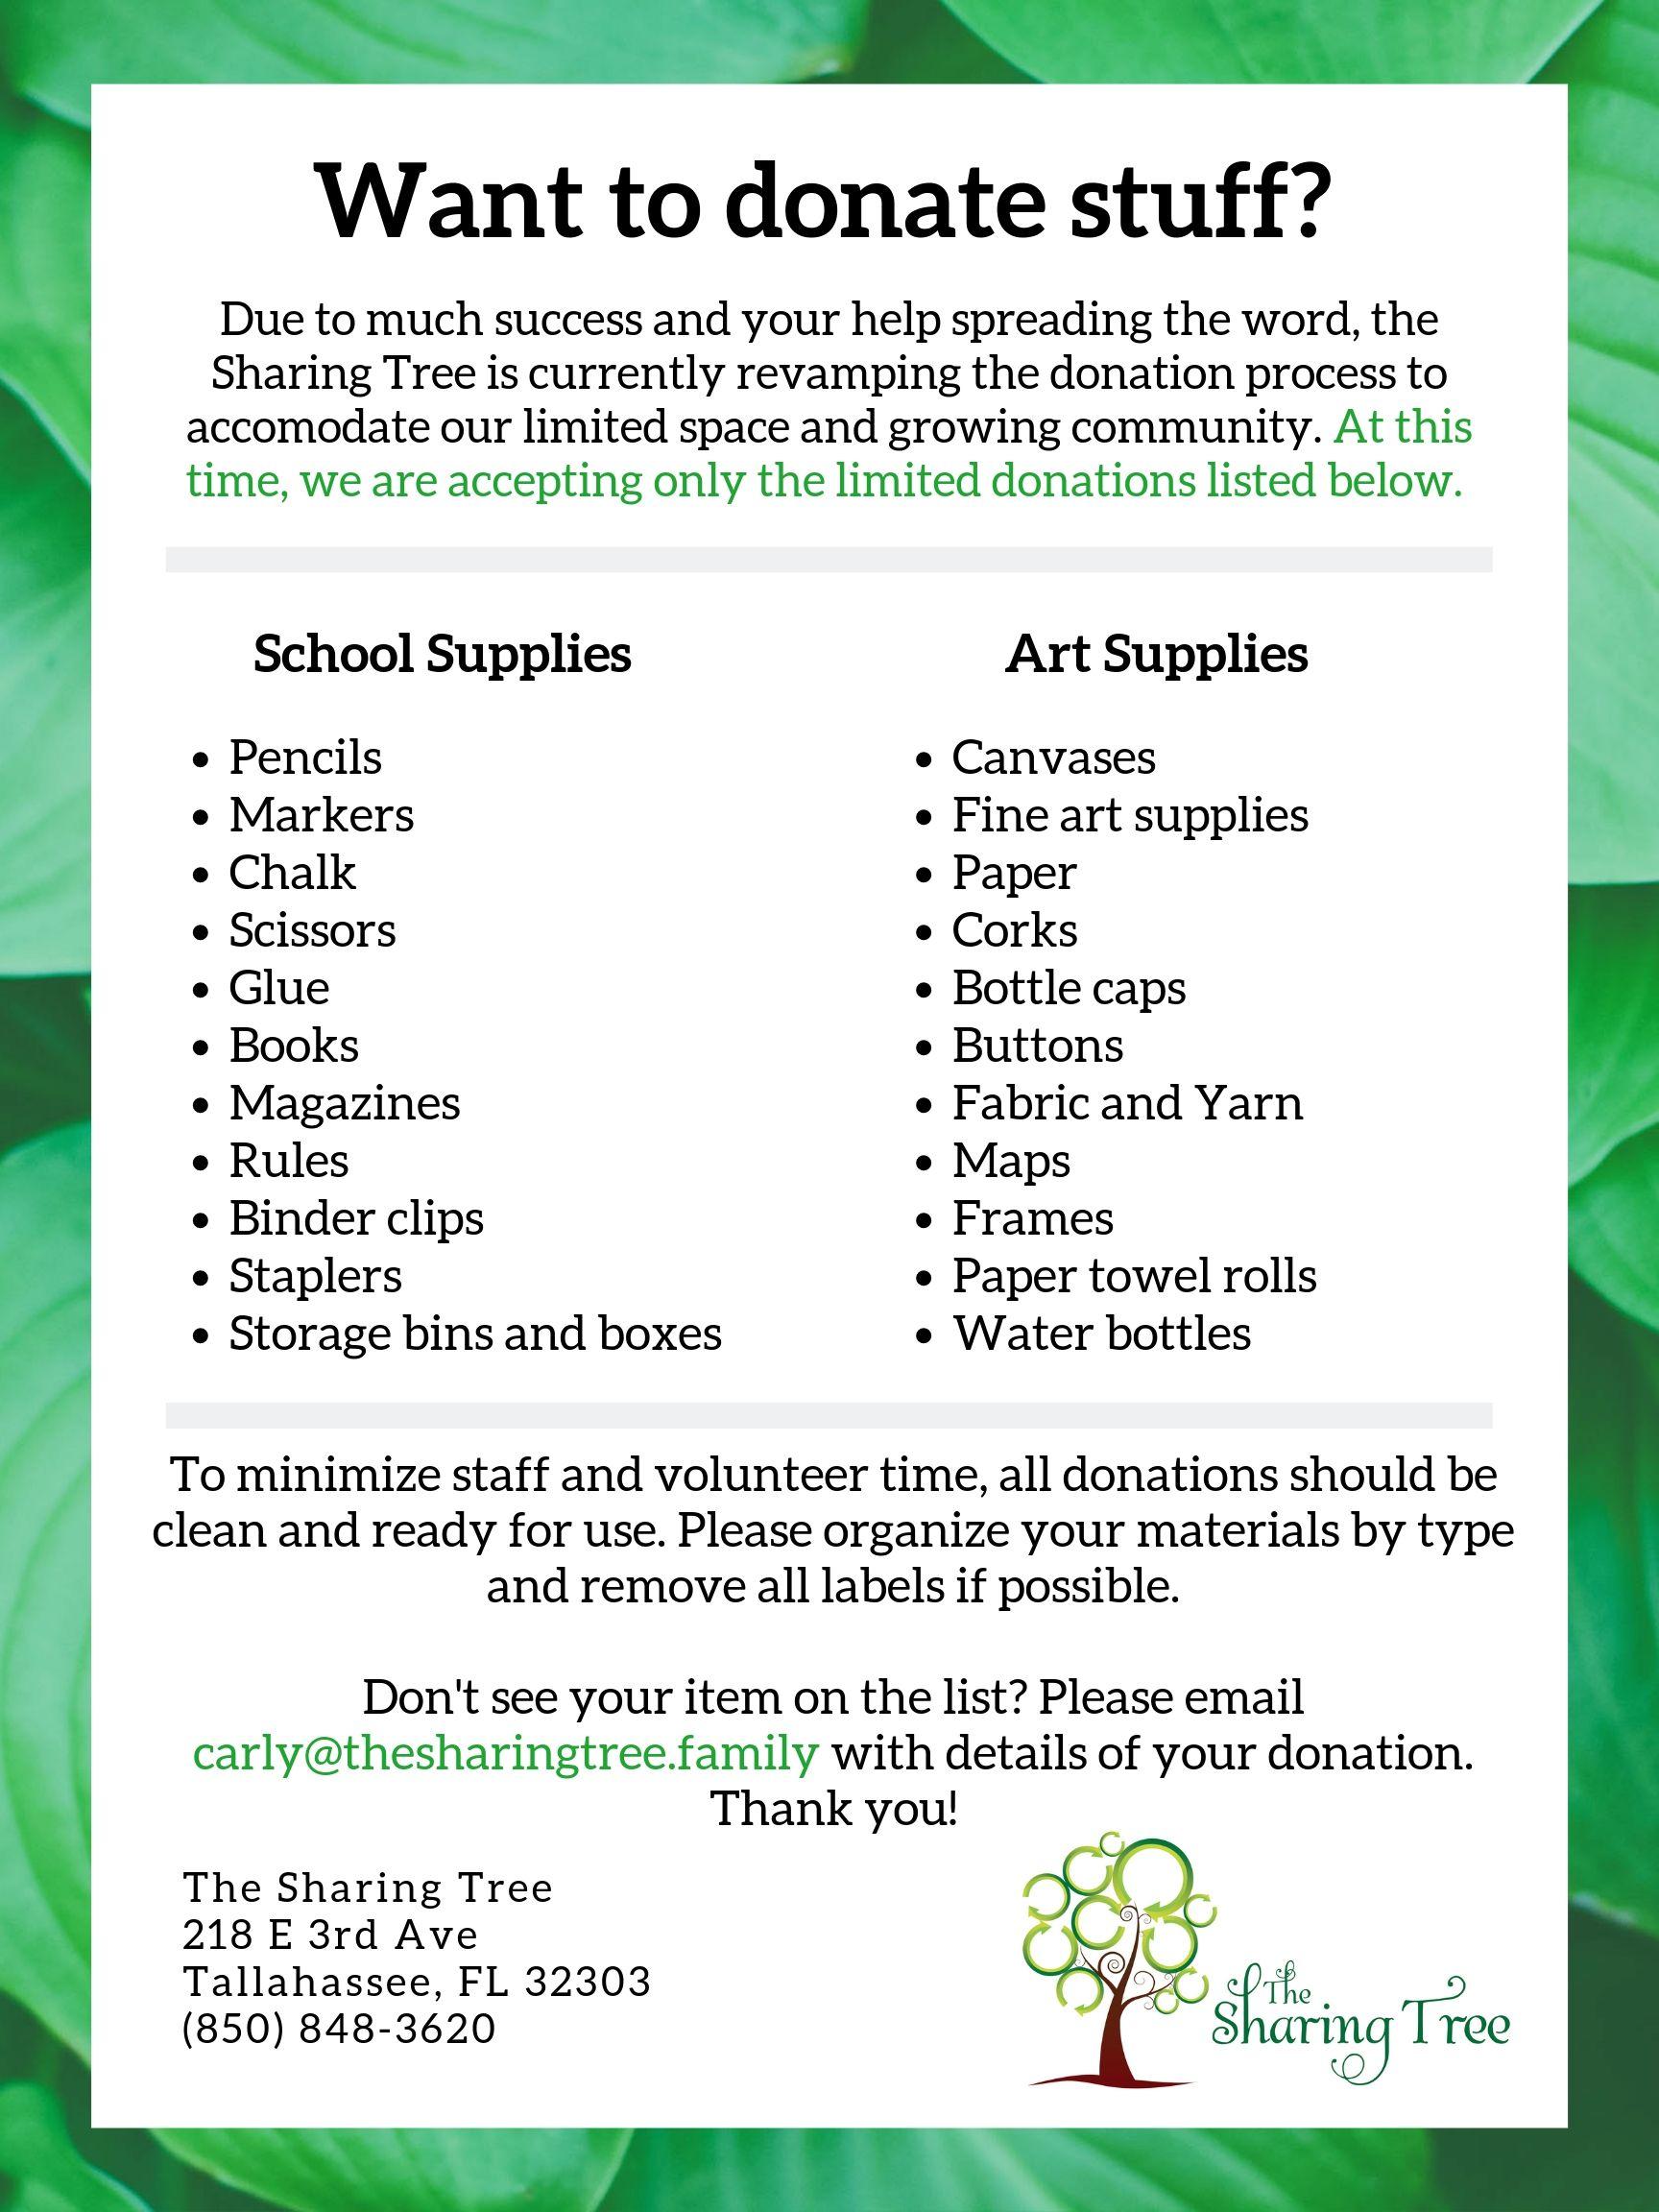 The Sharing Tree Donations List.jpg